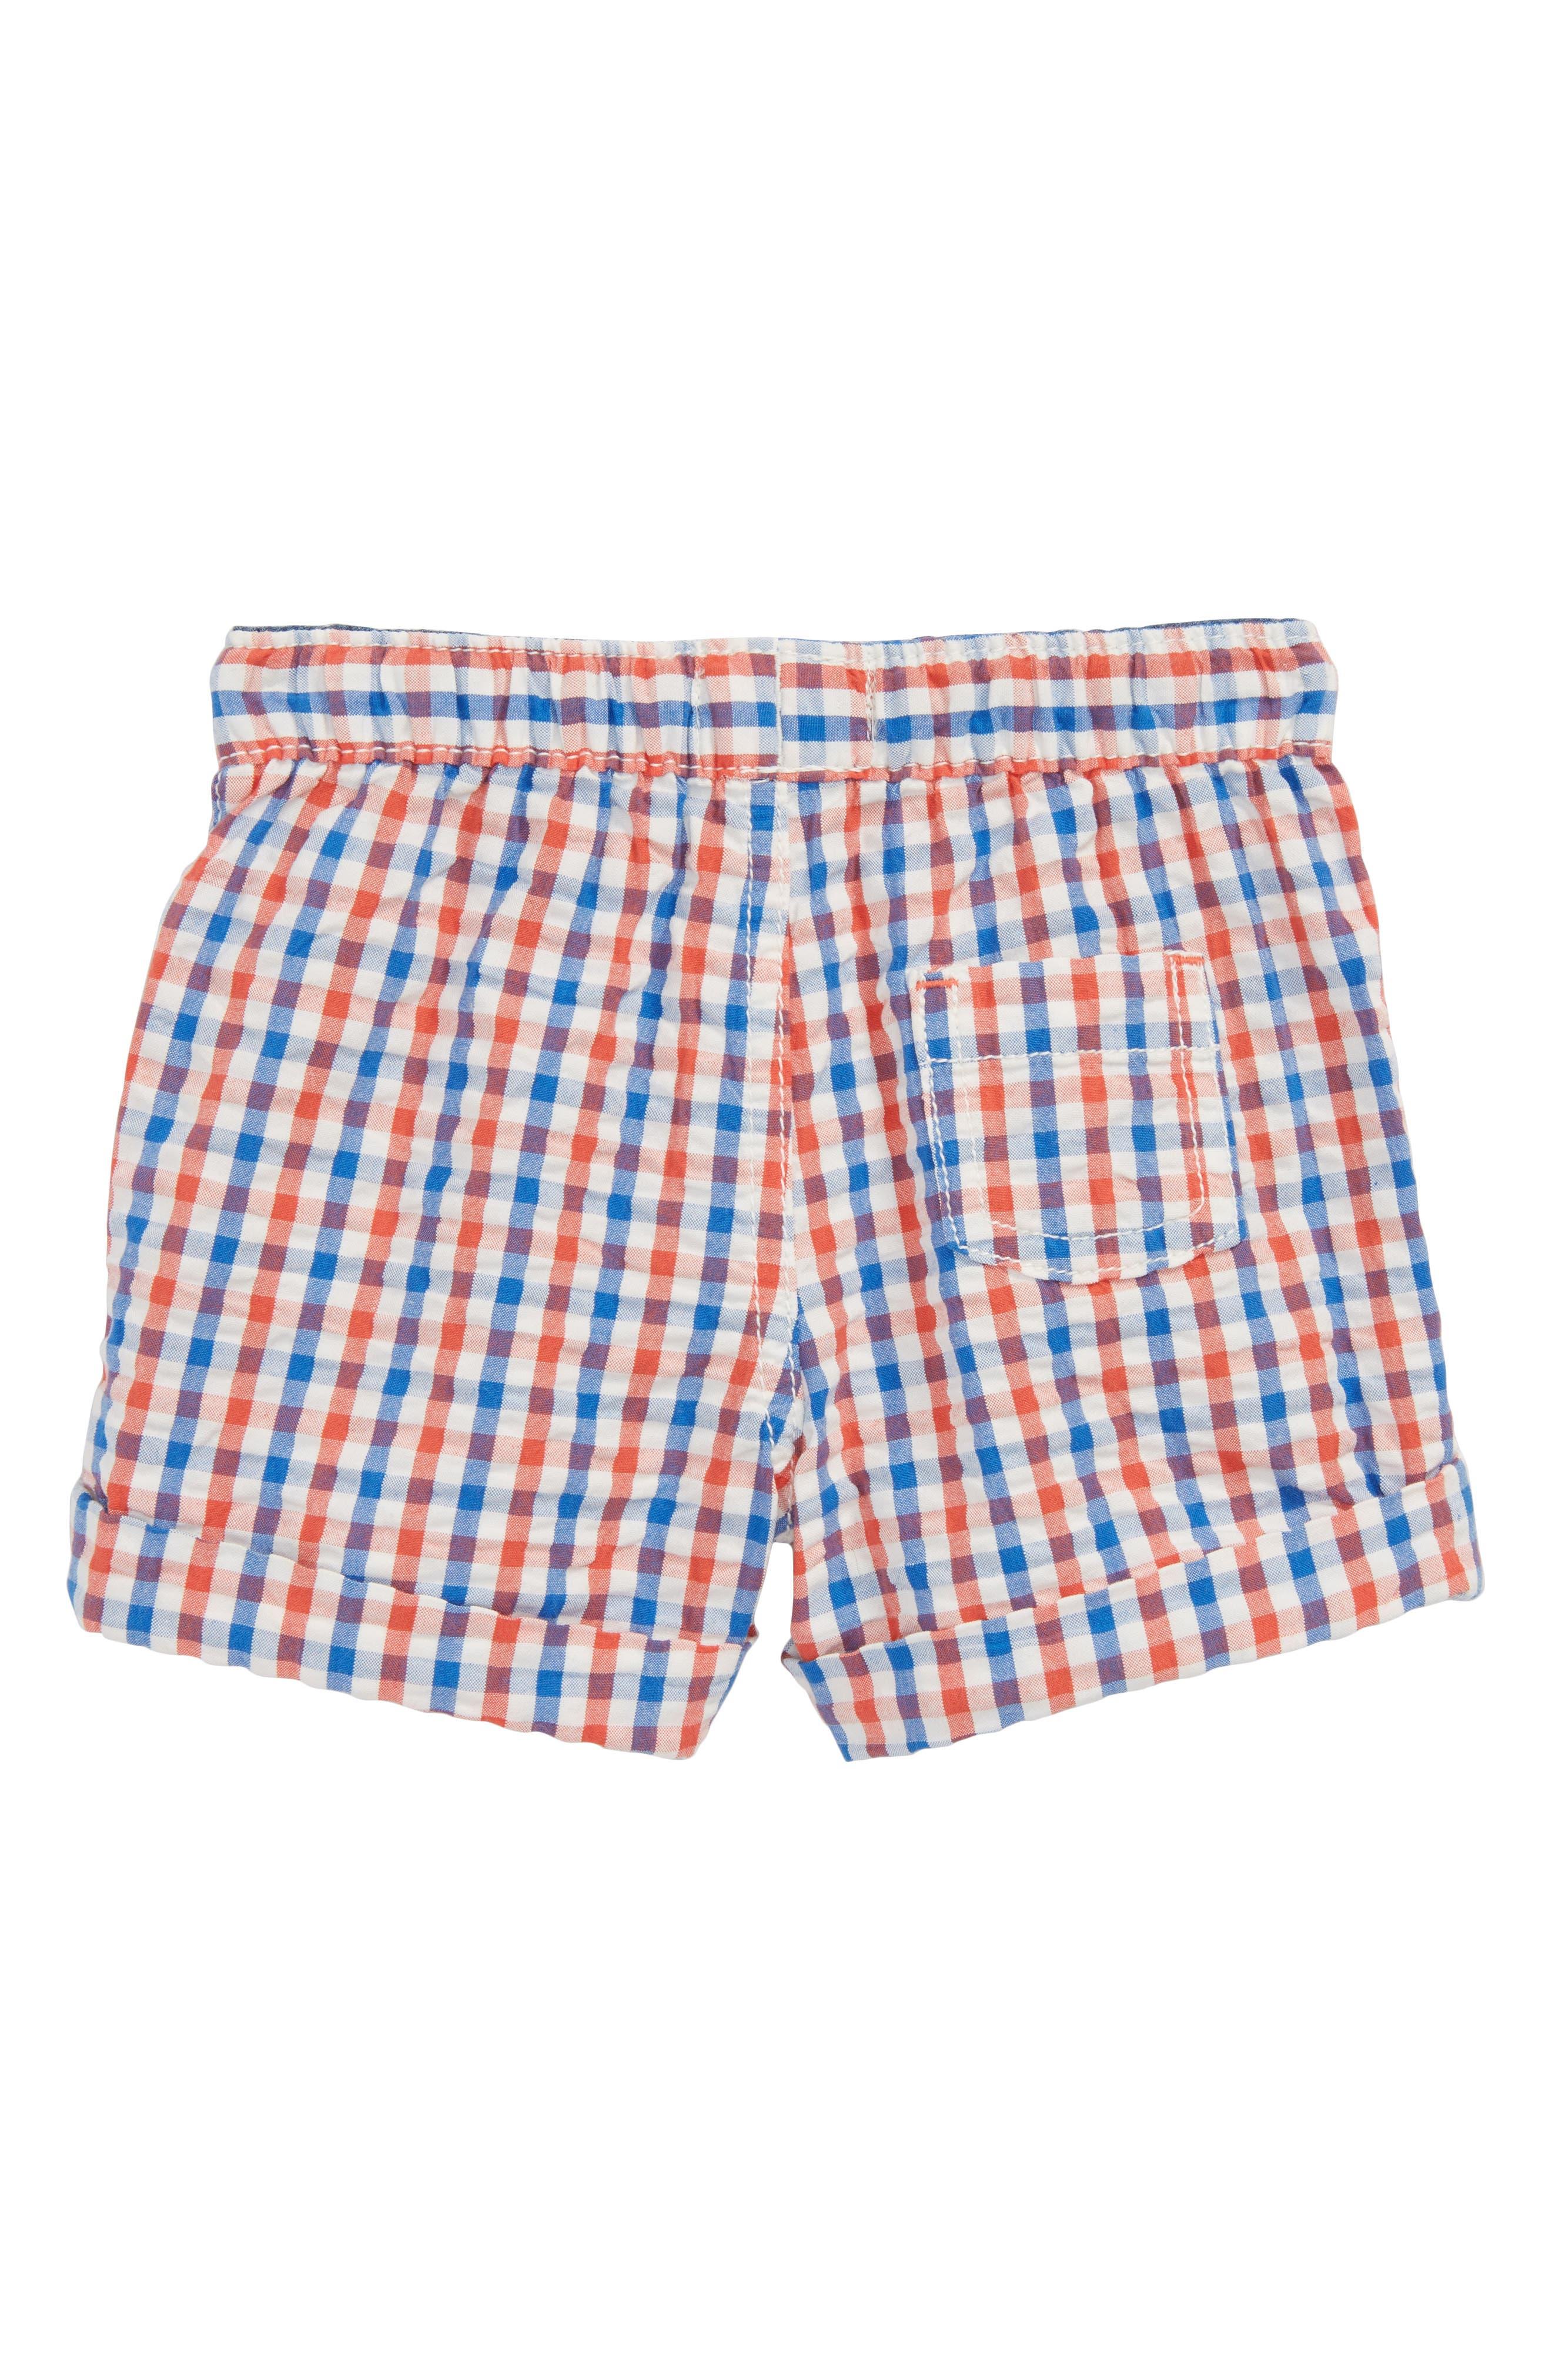 Explorer Gingham Shorts,                             Alternate thumbnail 2, color,                             404